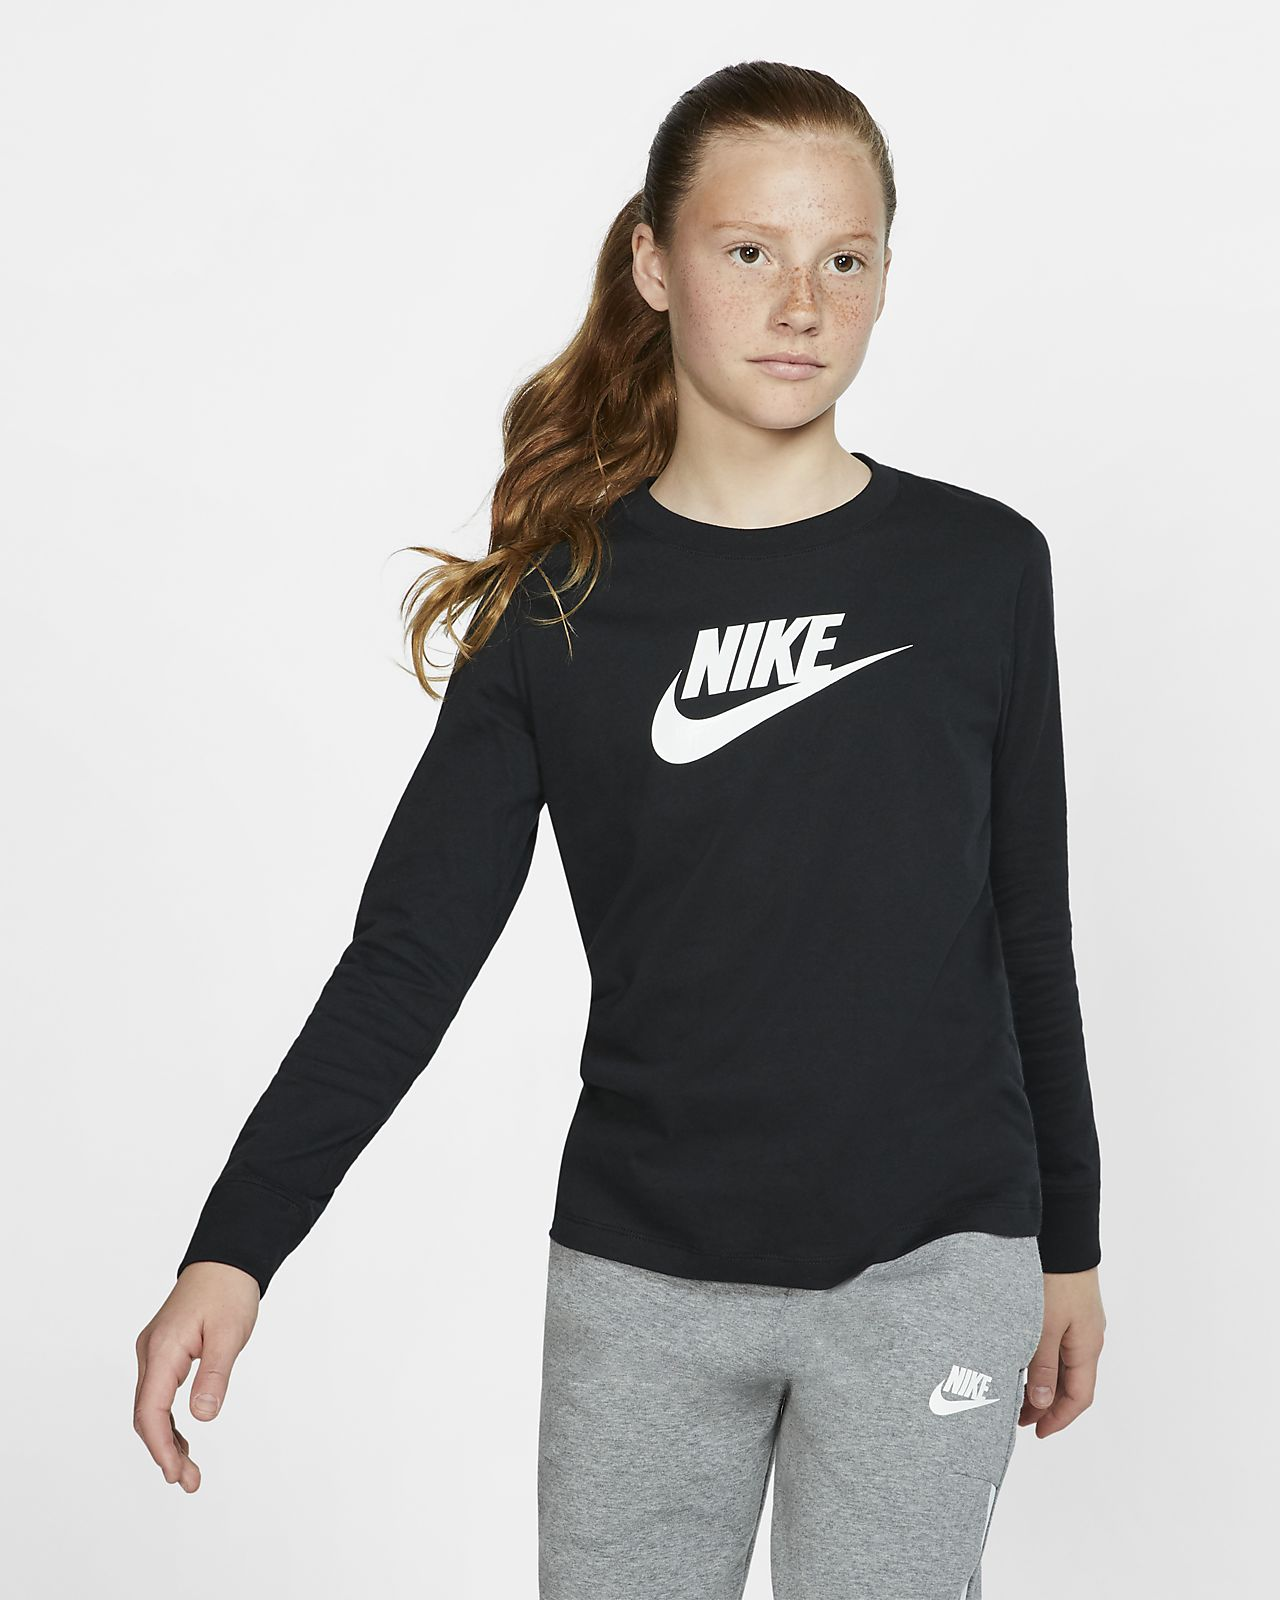 Camisola de manga comprida Nike Sportswear Júnior